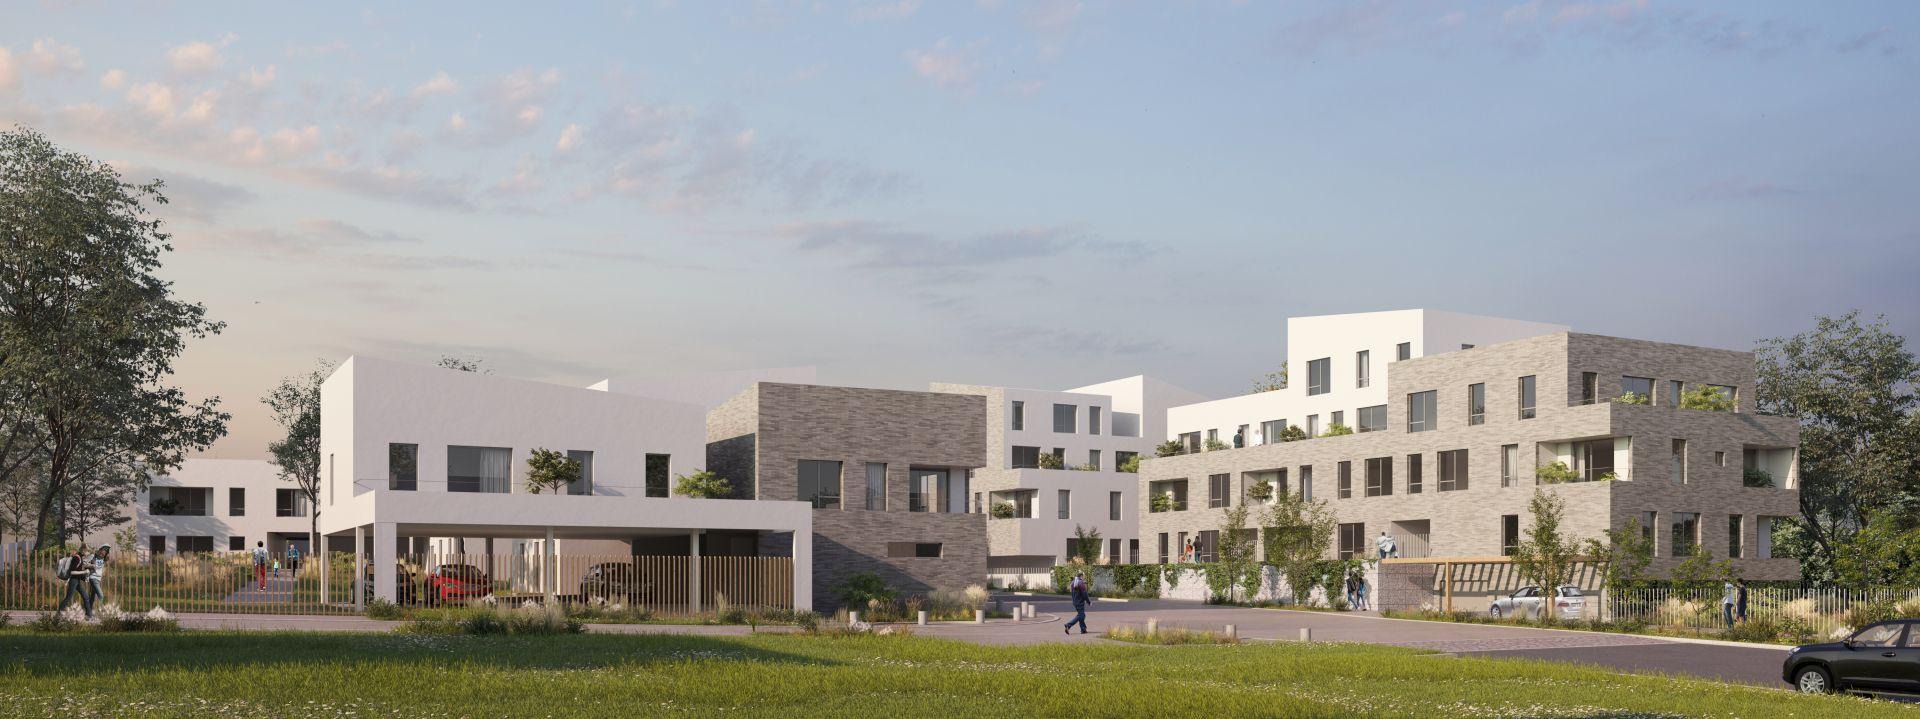 Supervue nakache orihuela architectes lgt bruyere le chatel bMedium